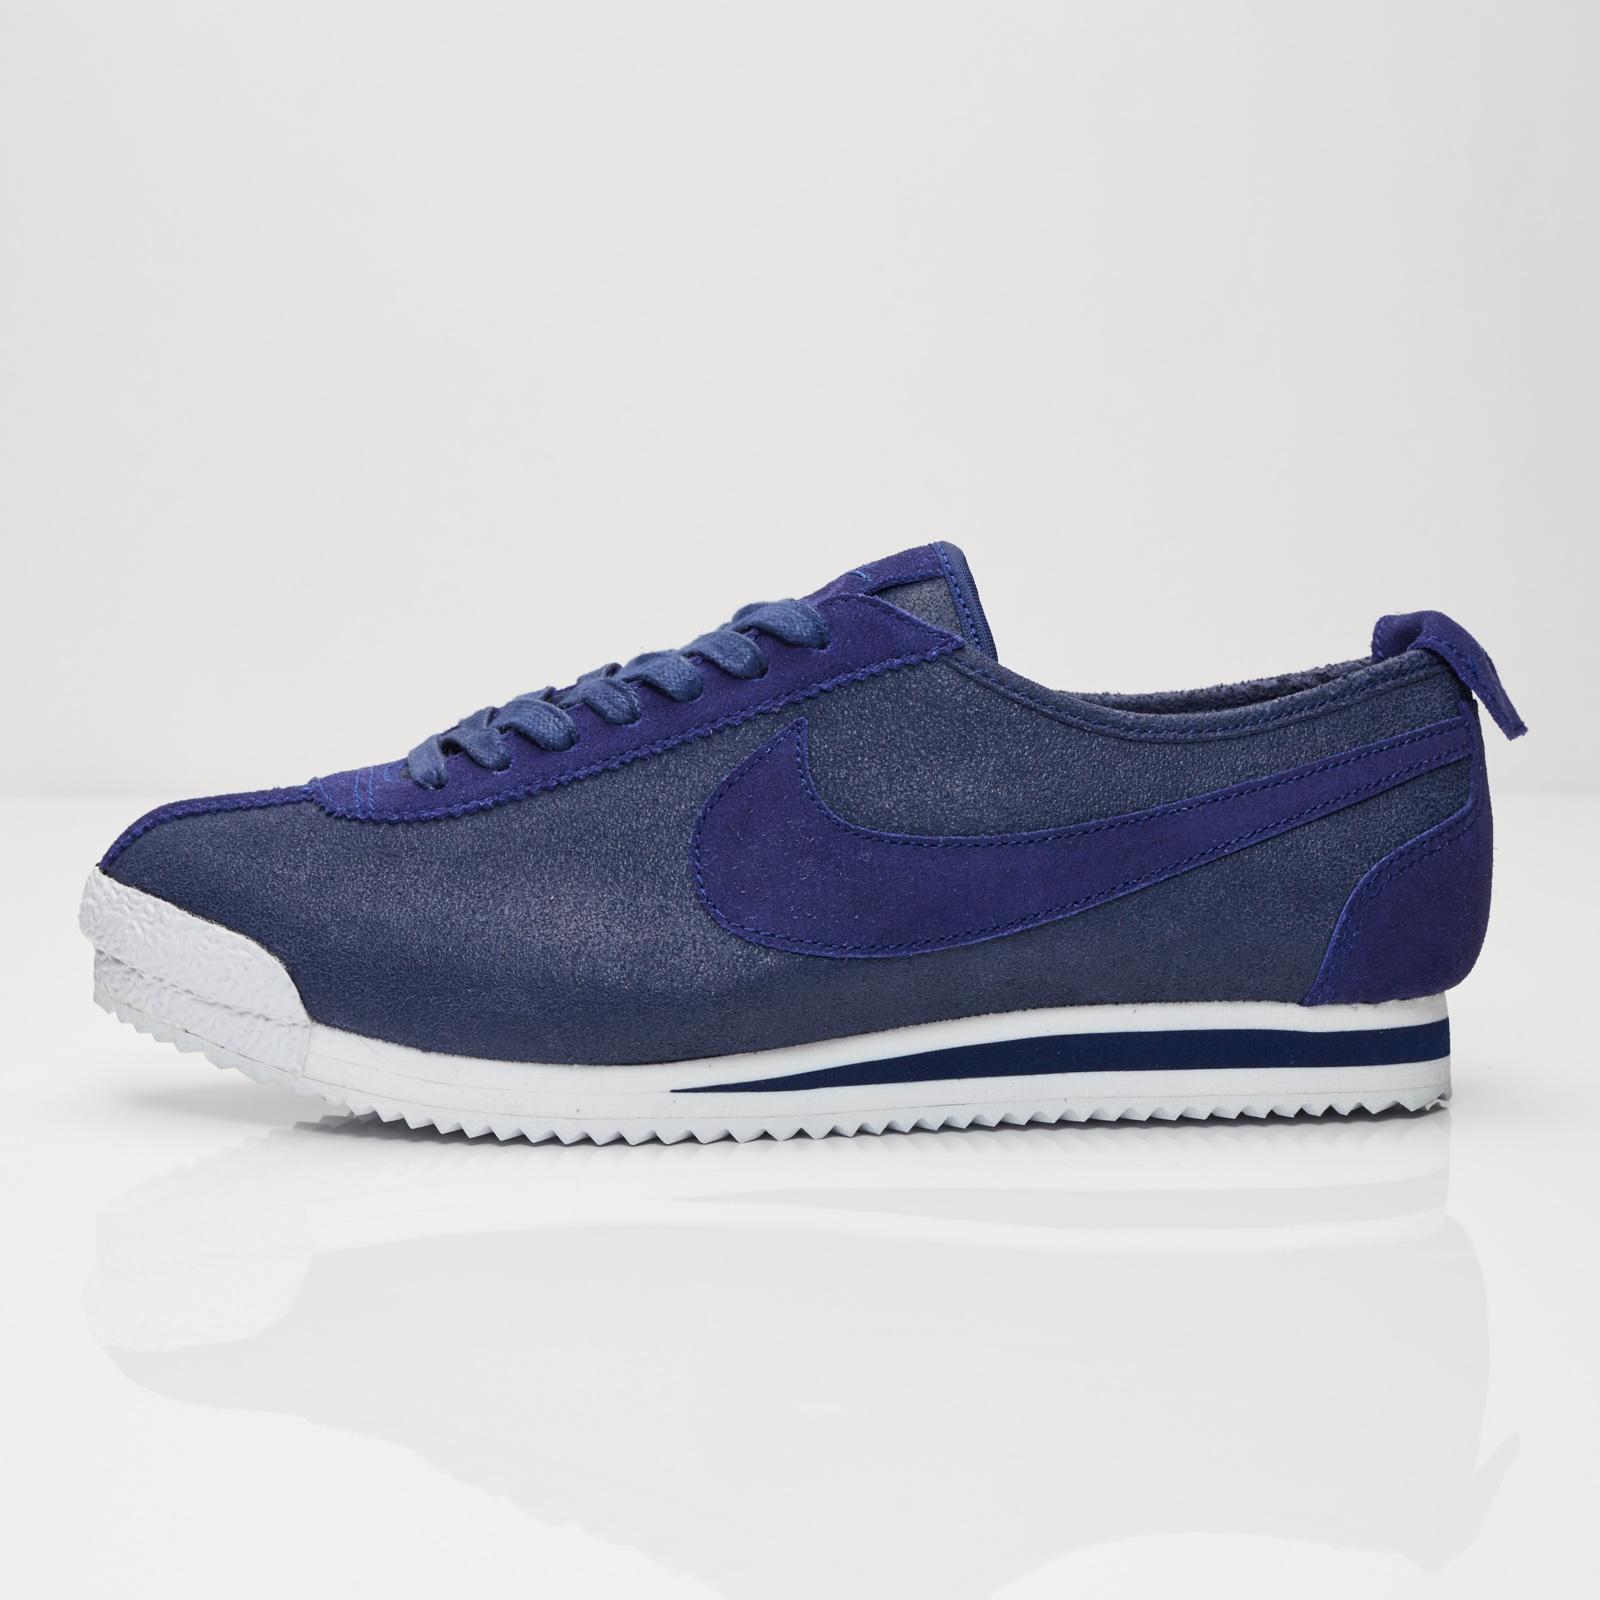 reputable site 68255 a5bdf Nike Cortez 72 - 863173-400 - Sneakersnstuff | sneakers ...